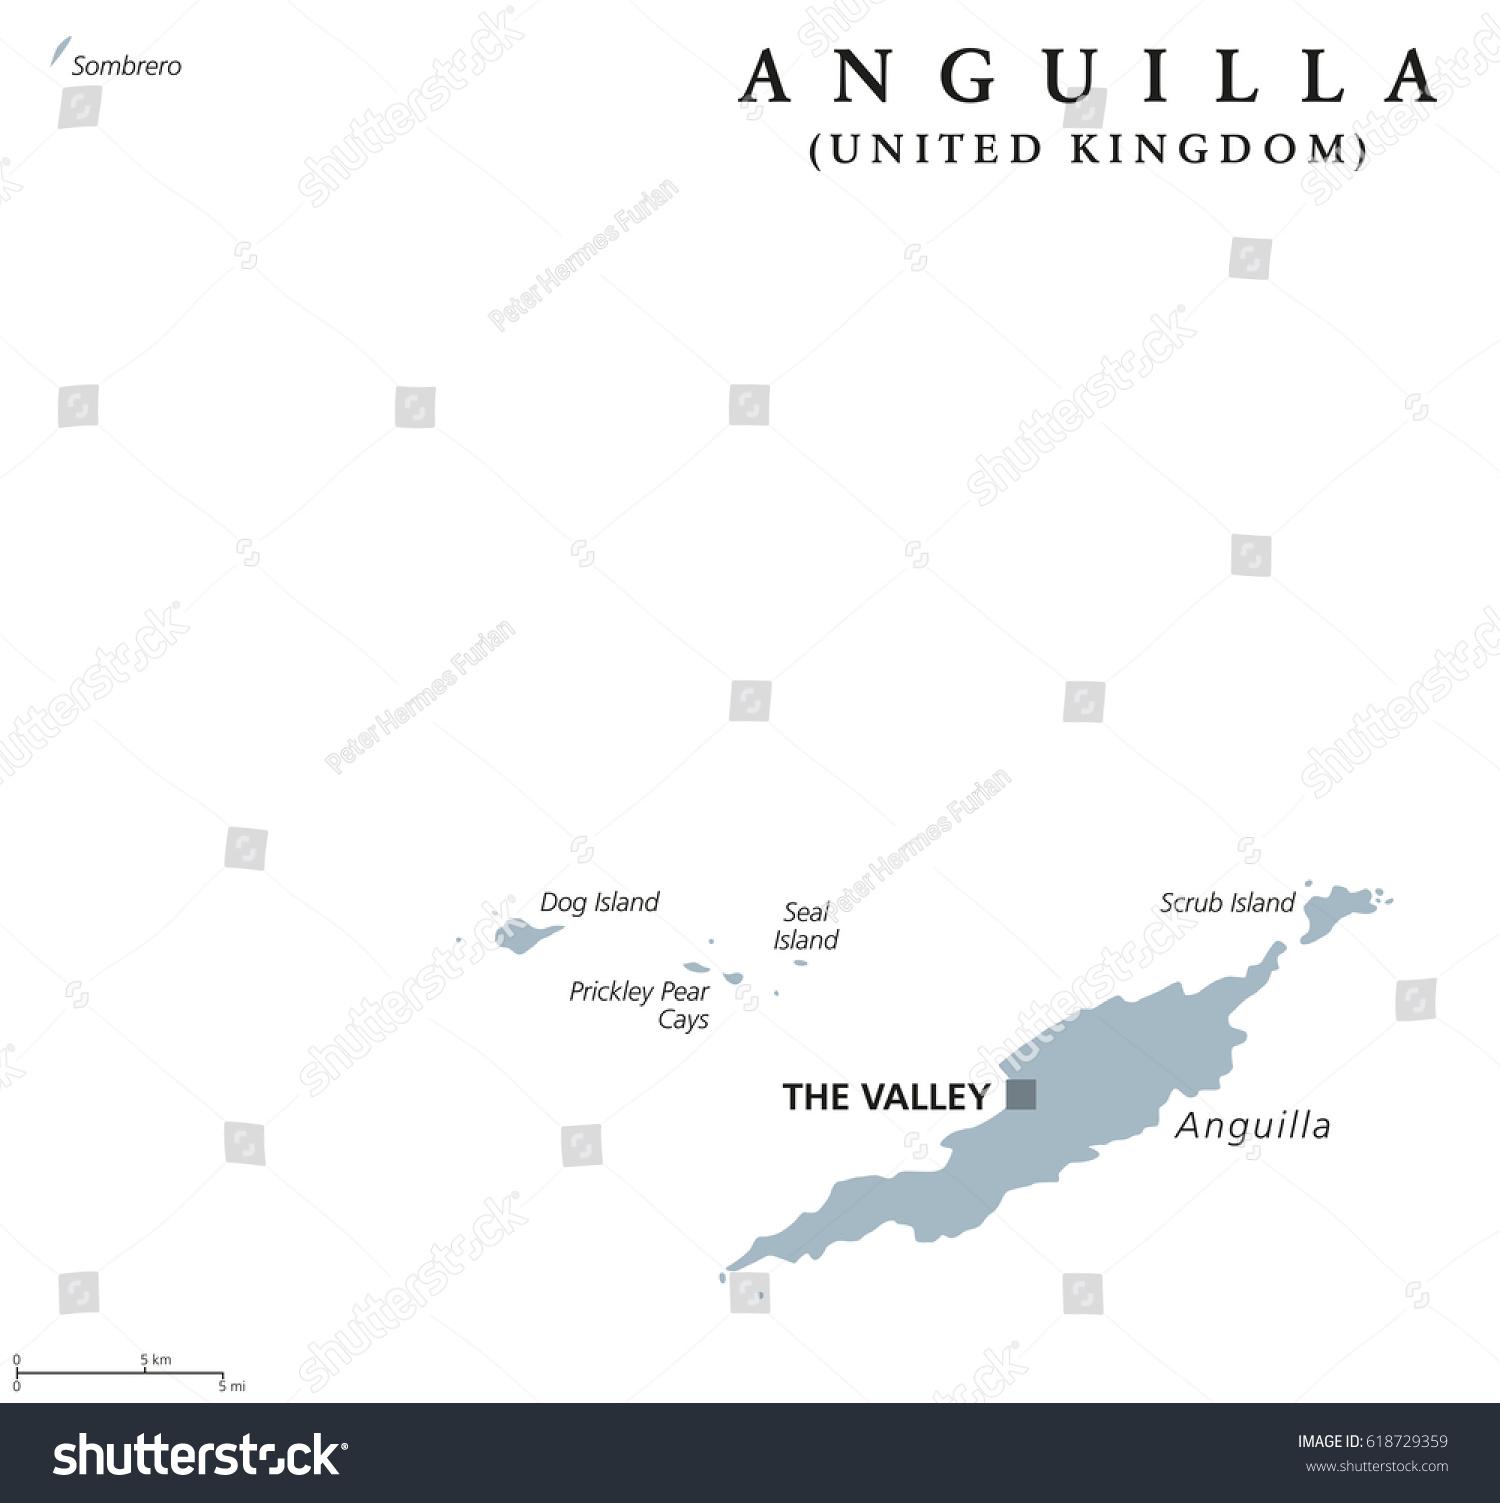 Netherlands Antilles Map Aruba Map Of The Solar System - Netherlands antilles aruba political map